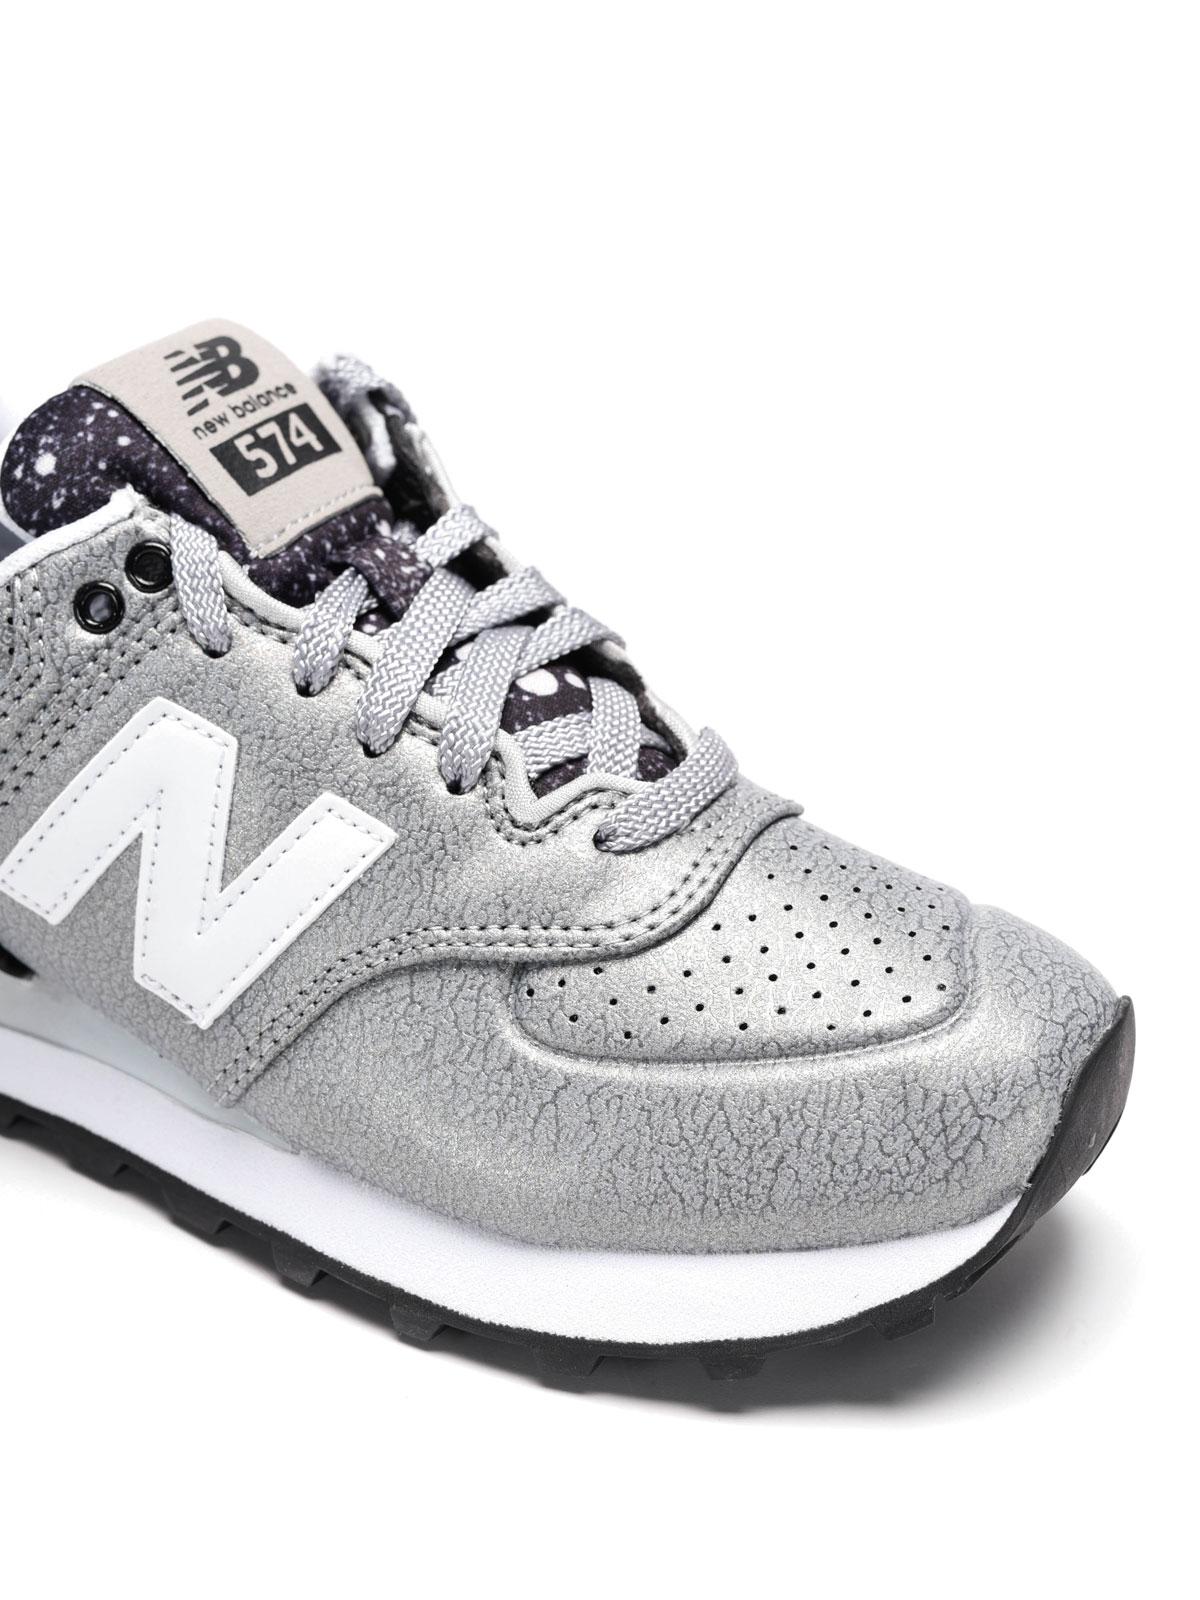 New Balance - Sneaker Fur Damen - Silber - Sneaker ...